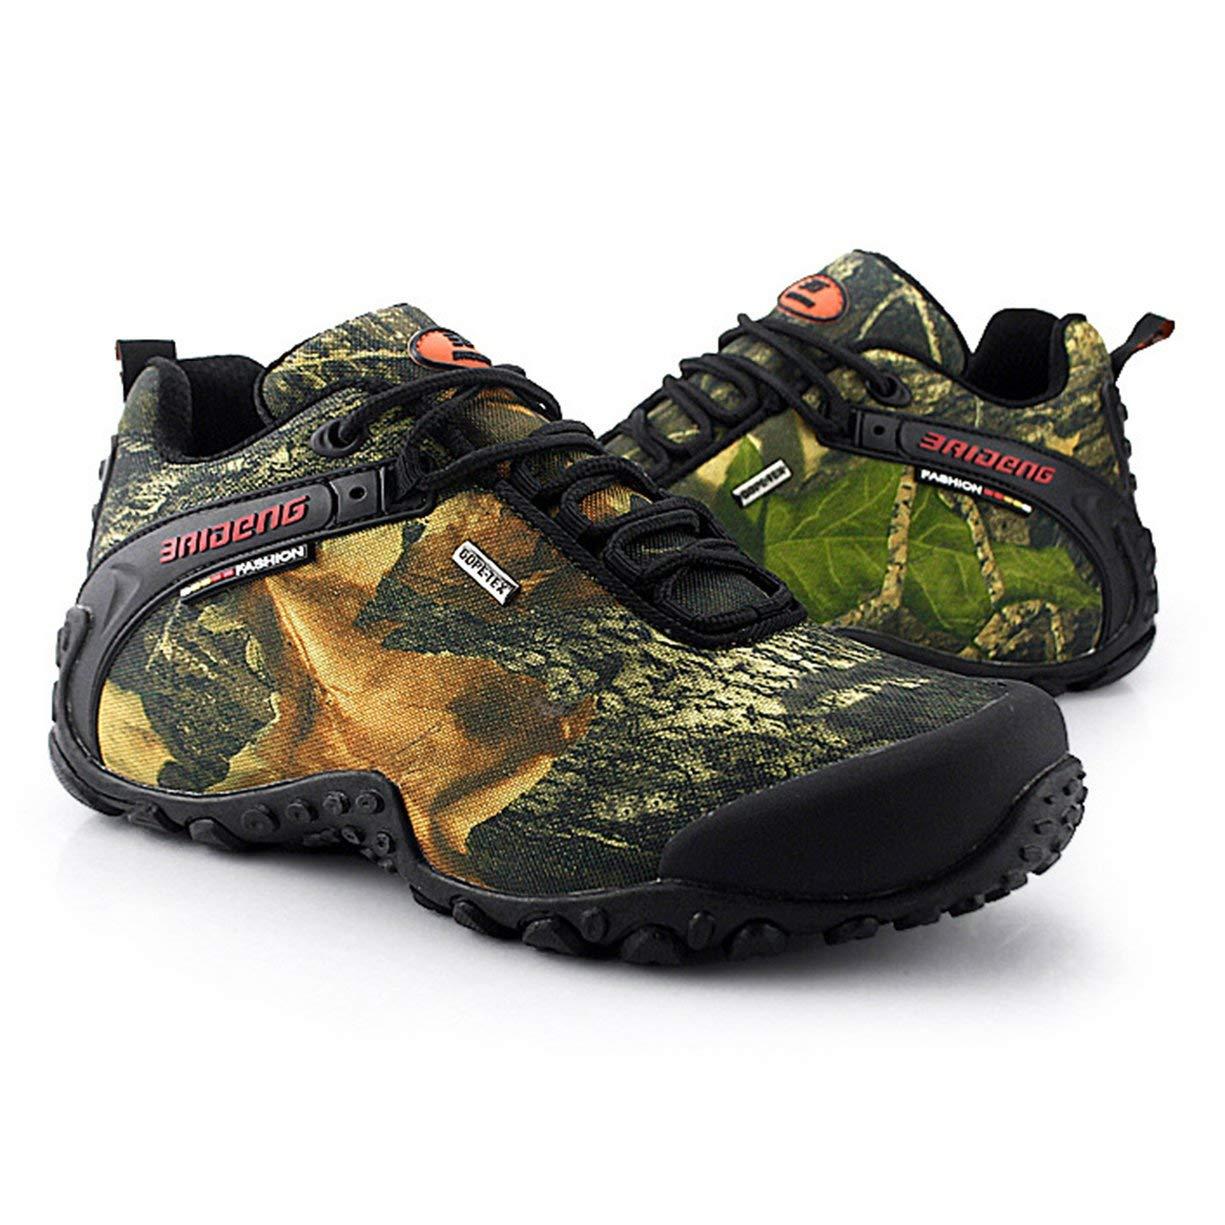 Zapatos de Senderismo Impermeables al al al Aire Libre para Hombres con Cordones de Camping Zapatos de monta ntilde;a para Escalar Zapatos Zapatos Transpirables Antideslizantes a89588